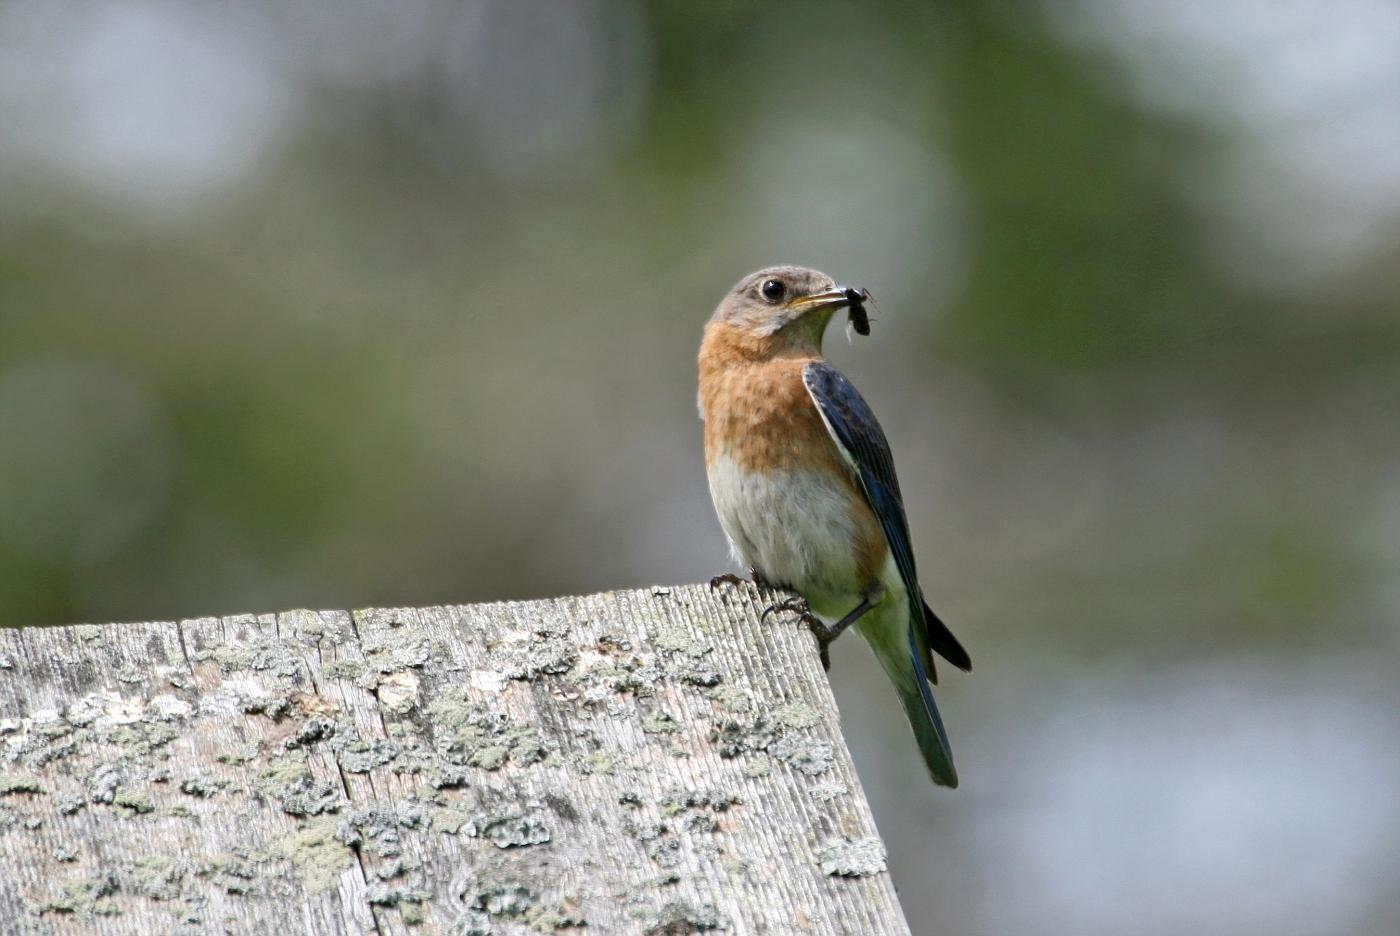 Female Bluebird #22